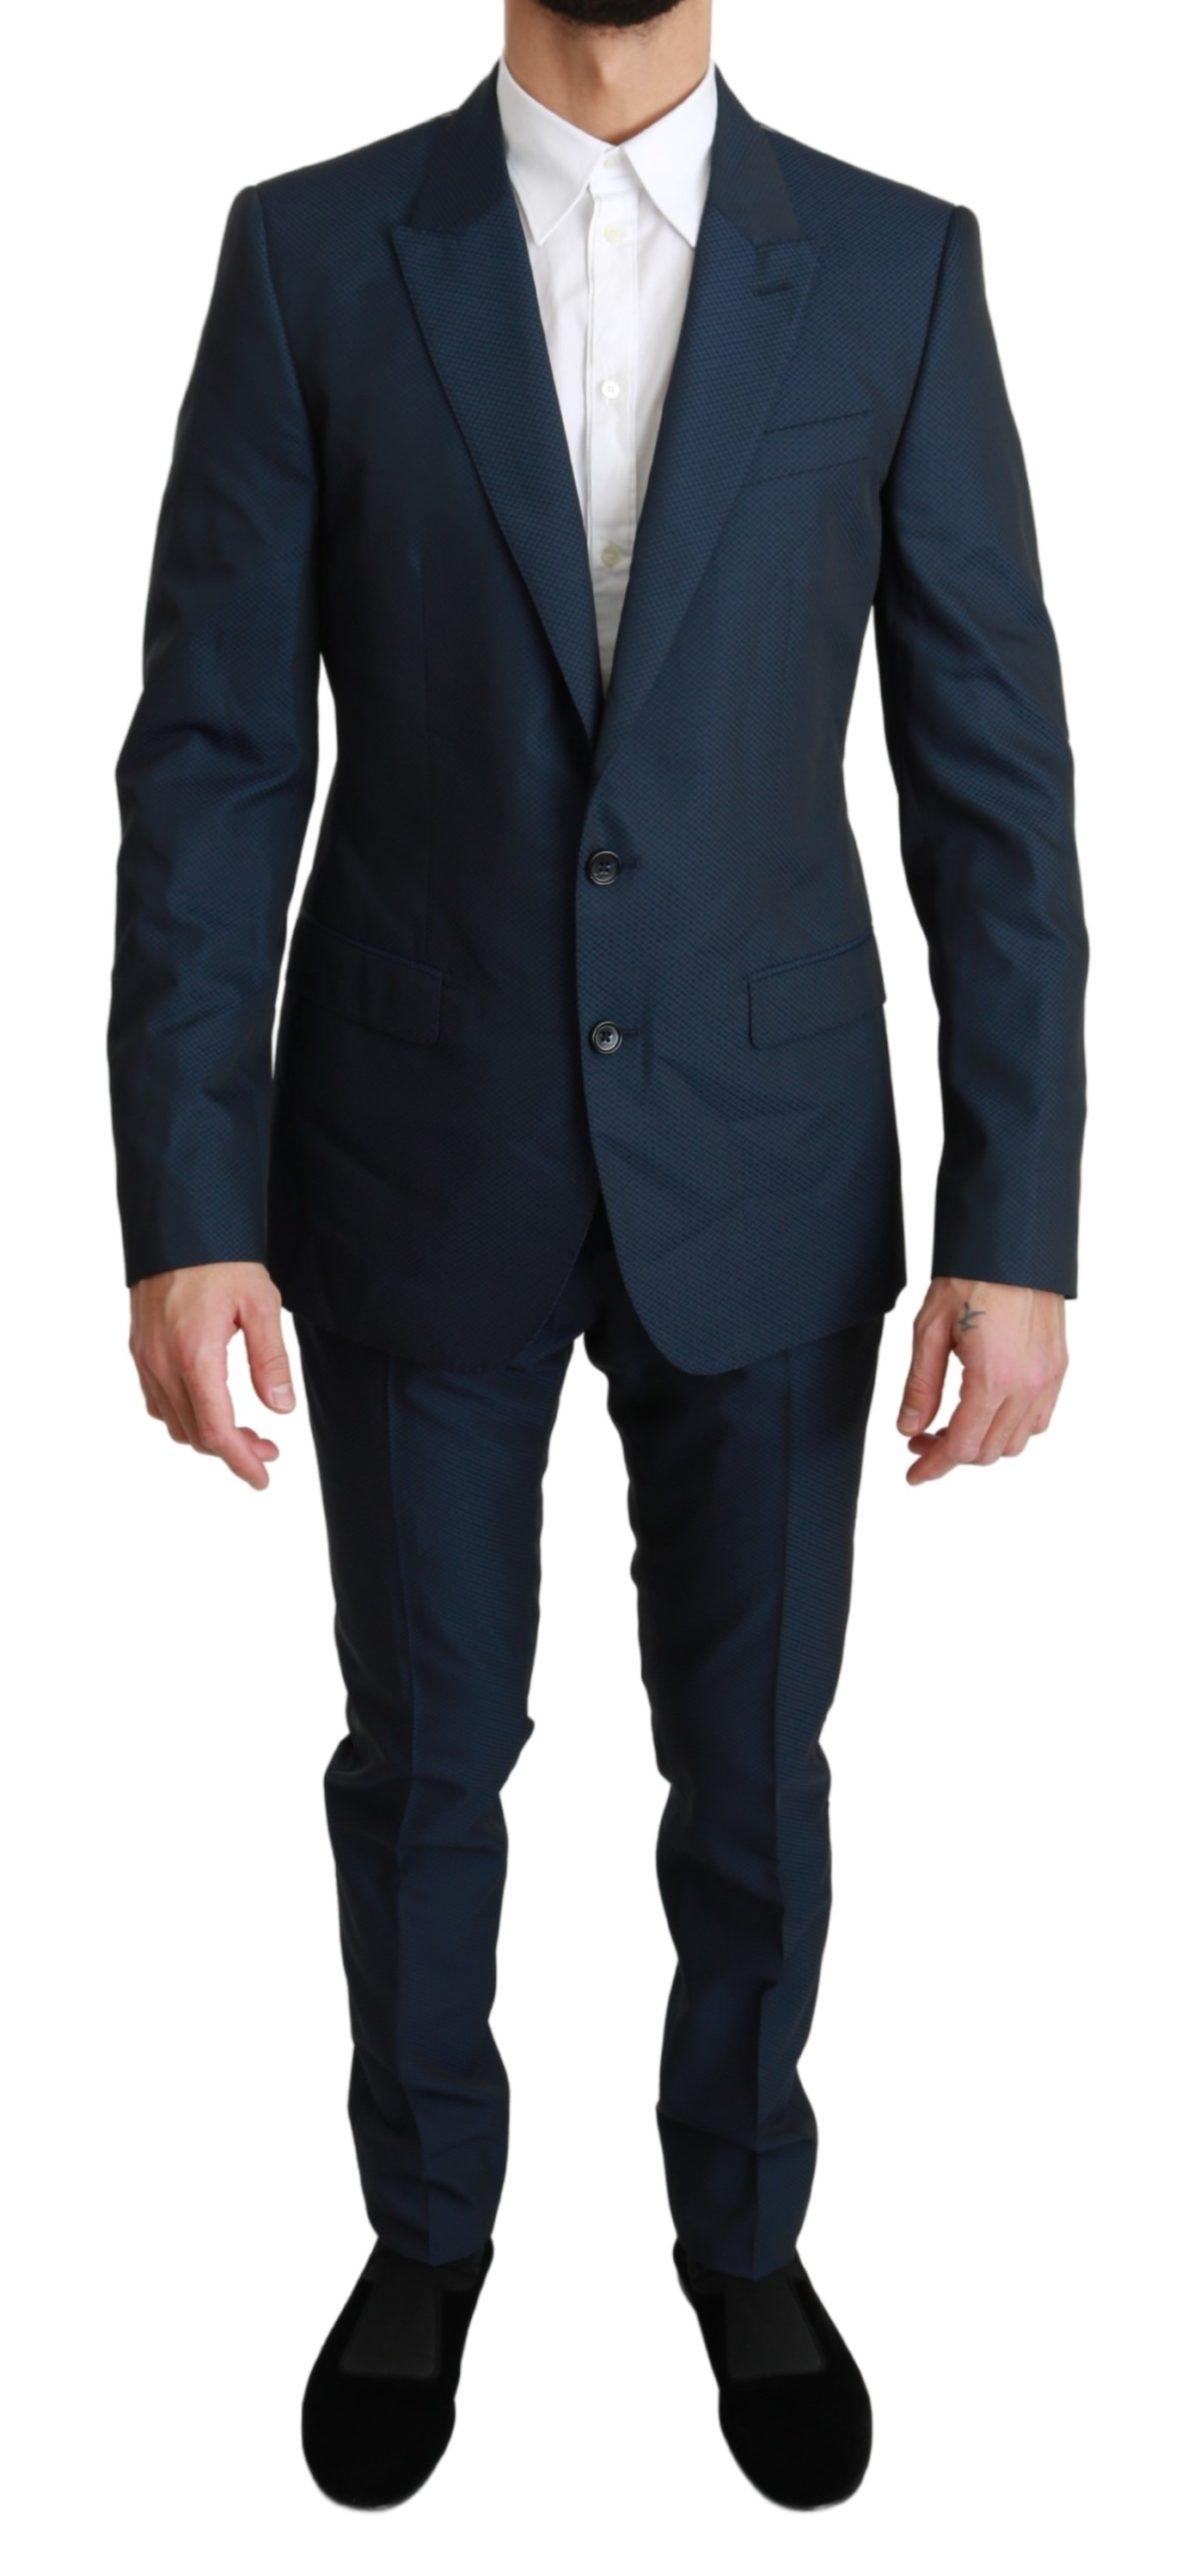 Dolce & Gabbana Men's Solid Wool 2 Piece MARTINI Suit Blue KOS1675 - IT48 | M